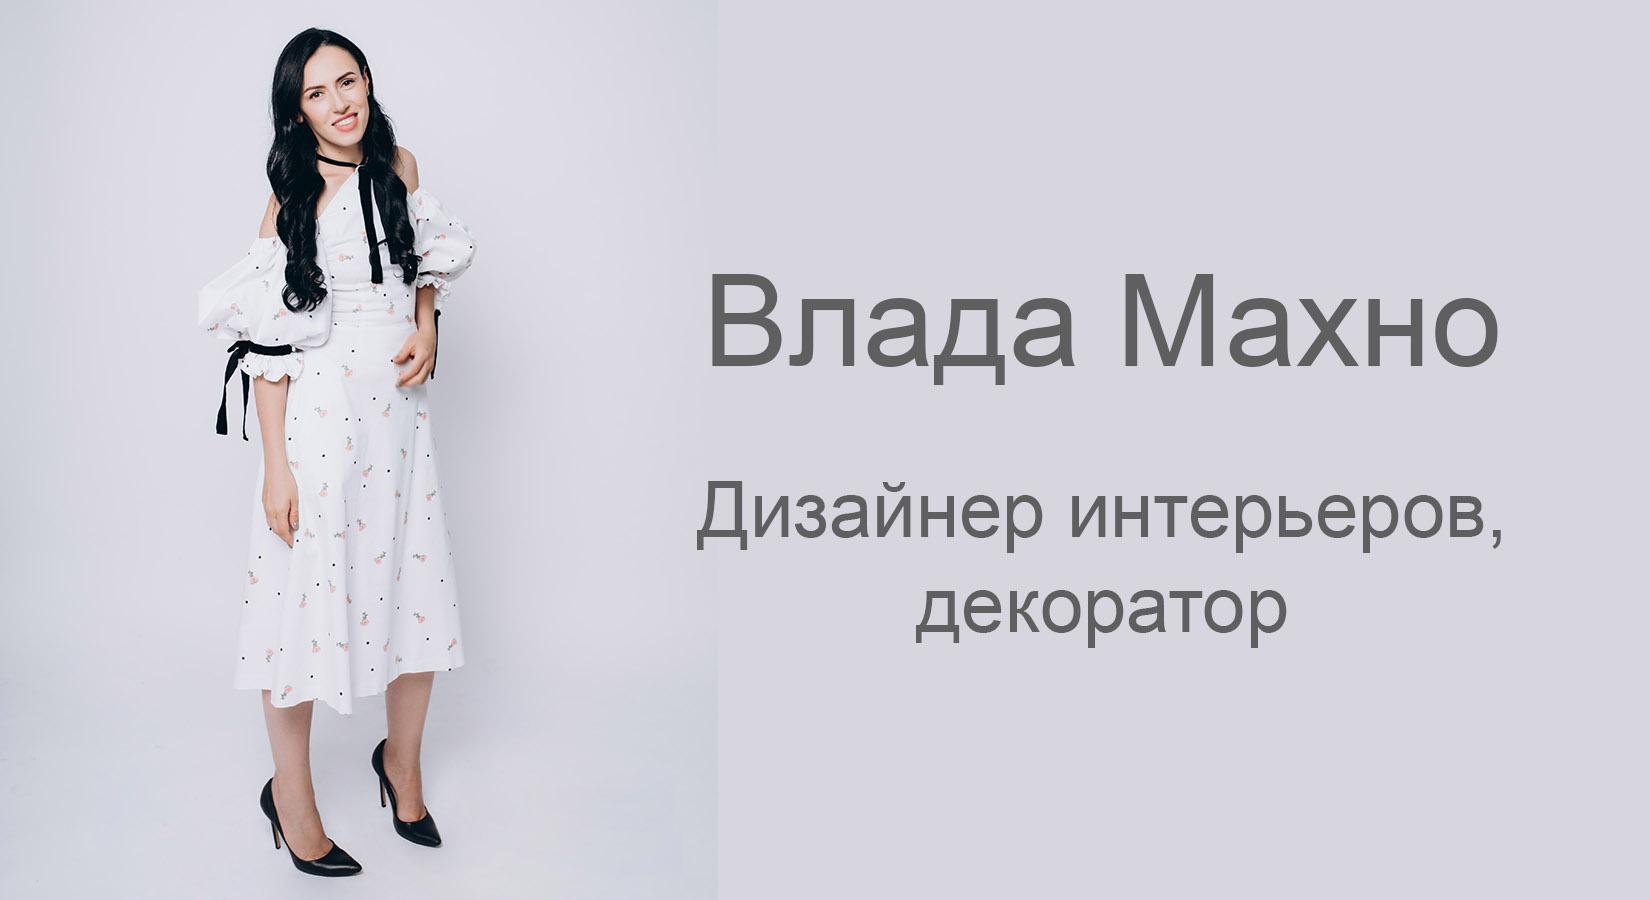 Интервью Влады Махно бренду DAVIS CASA